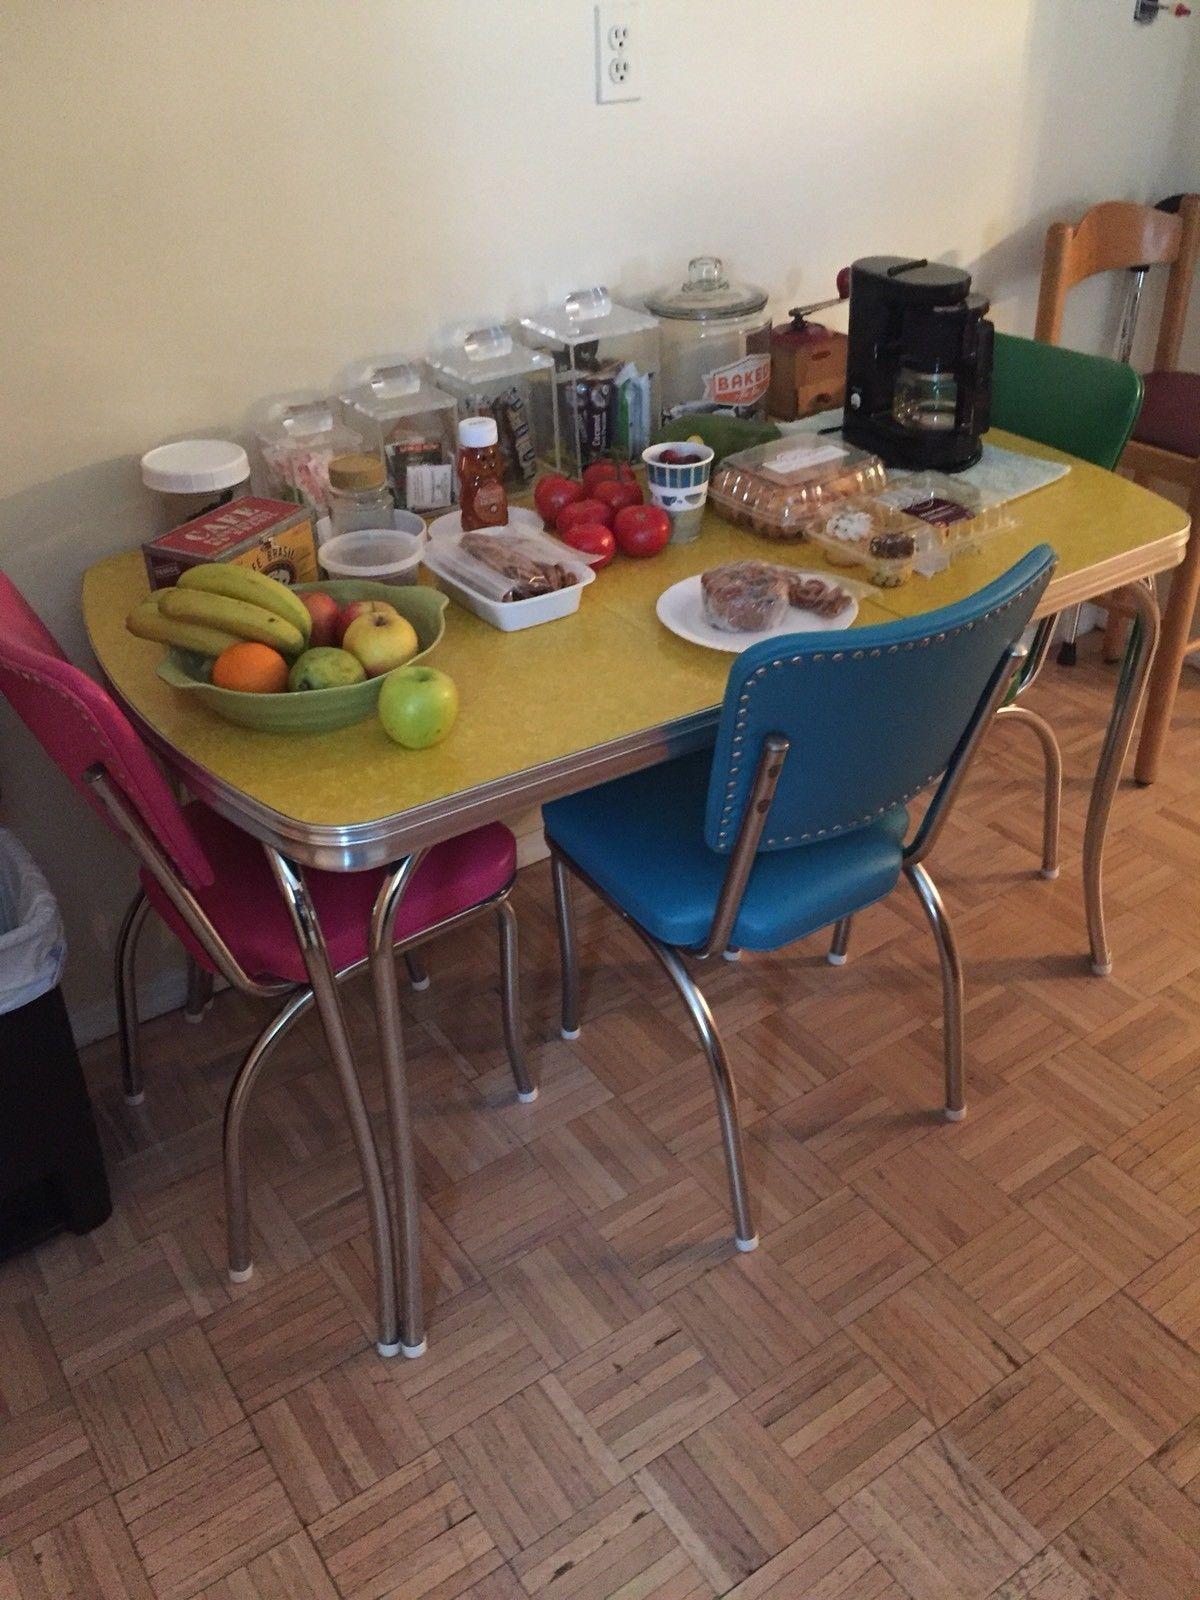 Retro Vintage 1950s 1960s Formica Table Retro Kitchen Retro Kitchen Tables Kitchen Table Settings